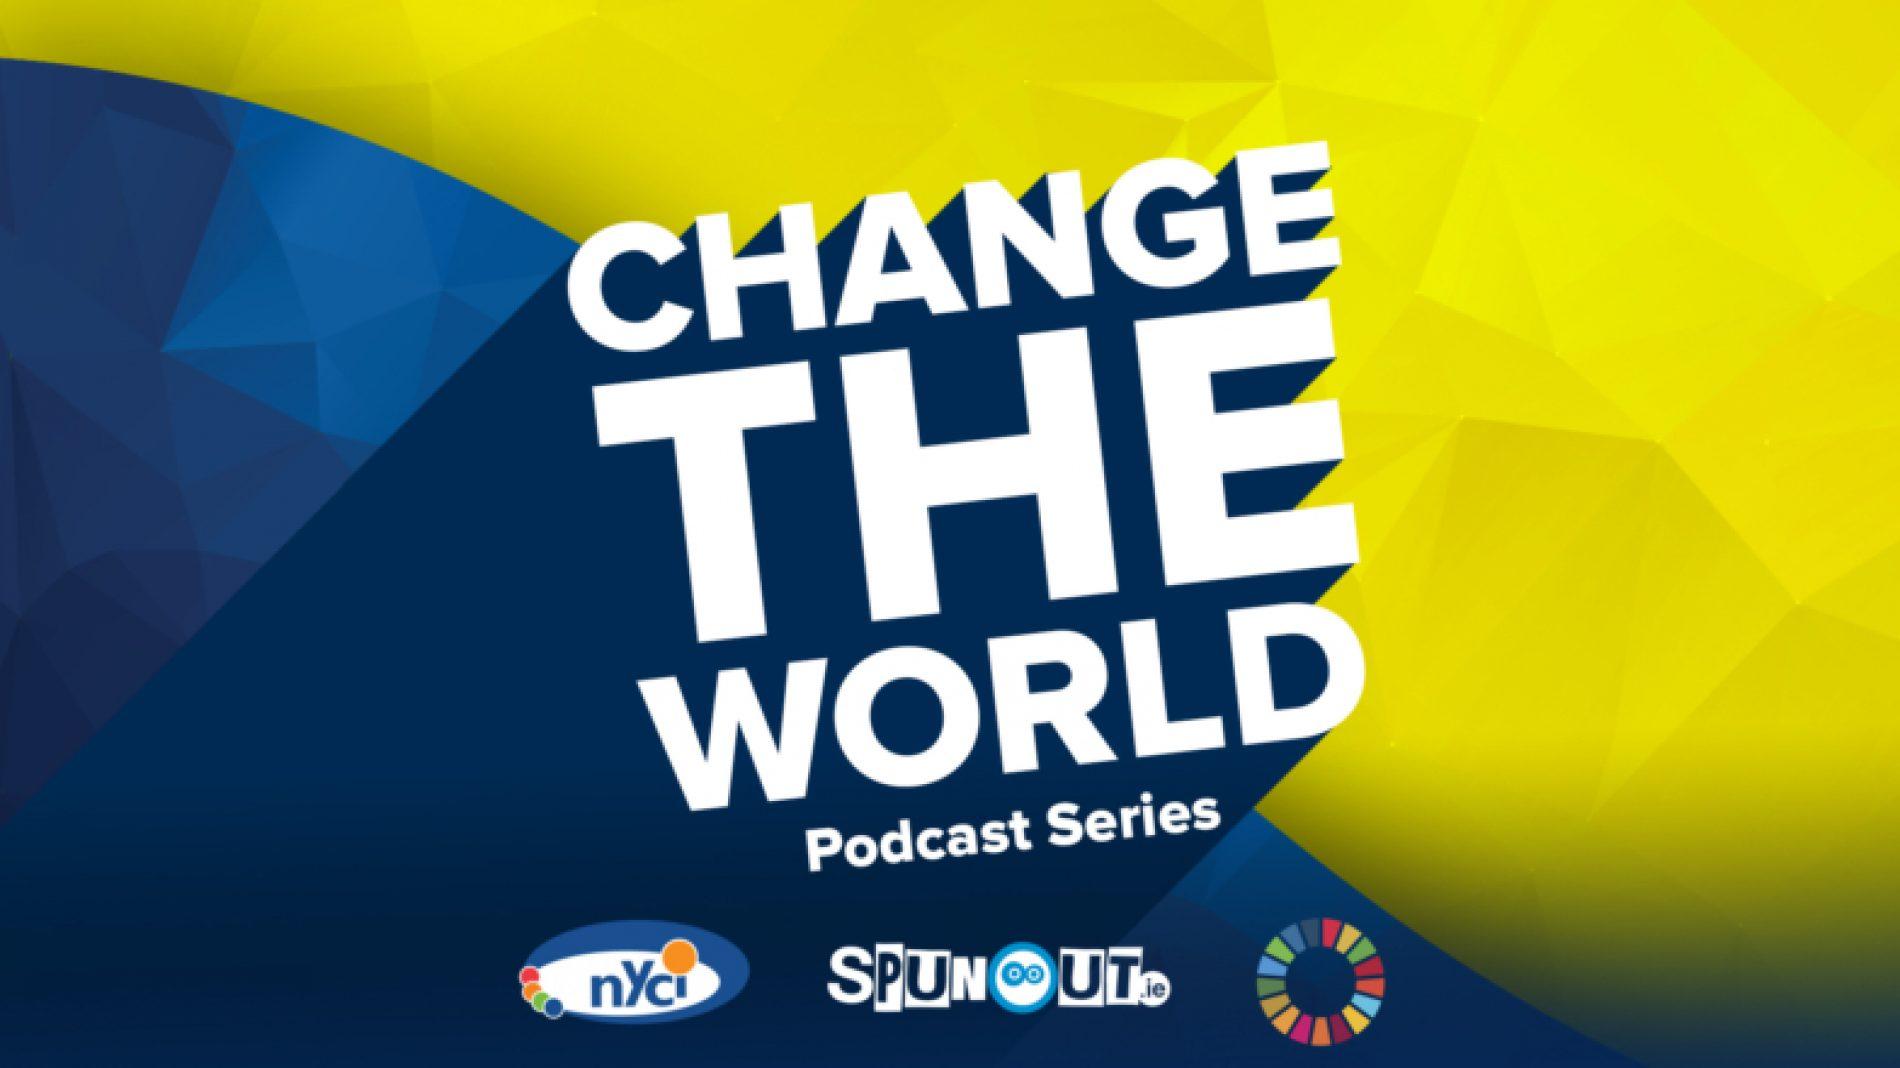 Change-the-World-Article-Cover-v2-GokN9z